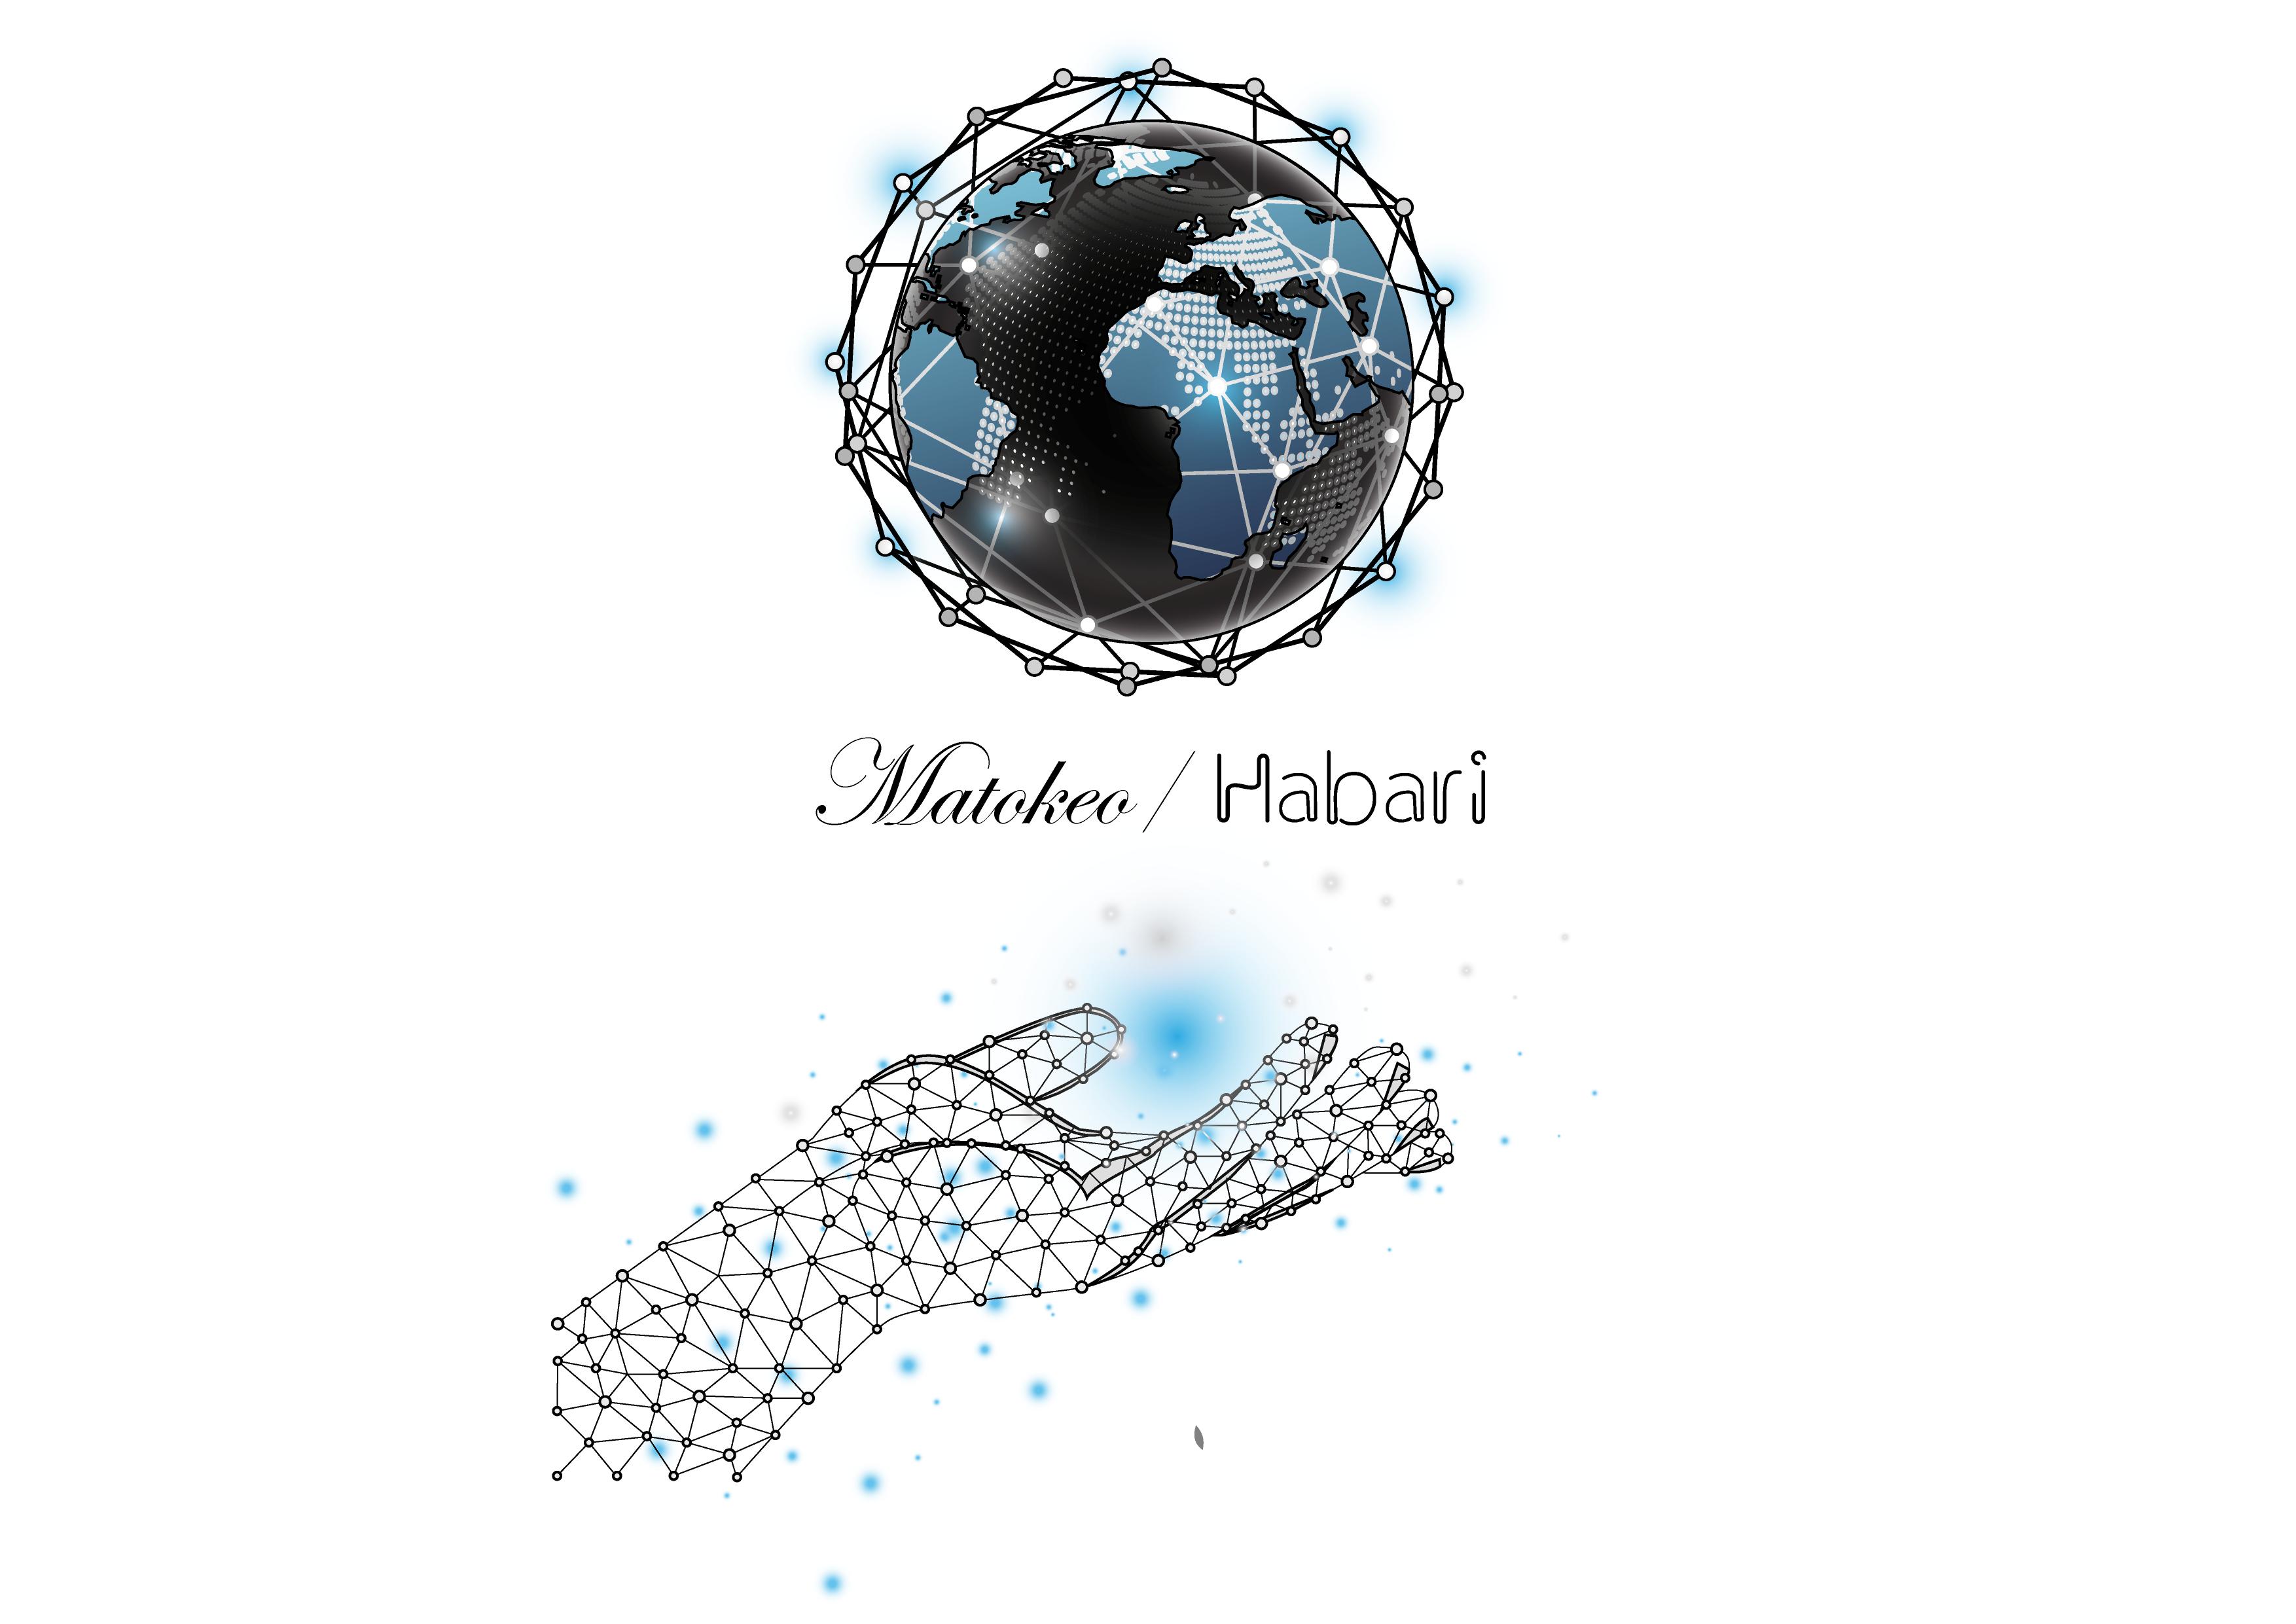 Matokeo-01.png